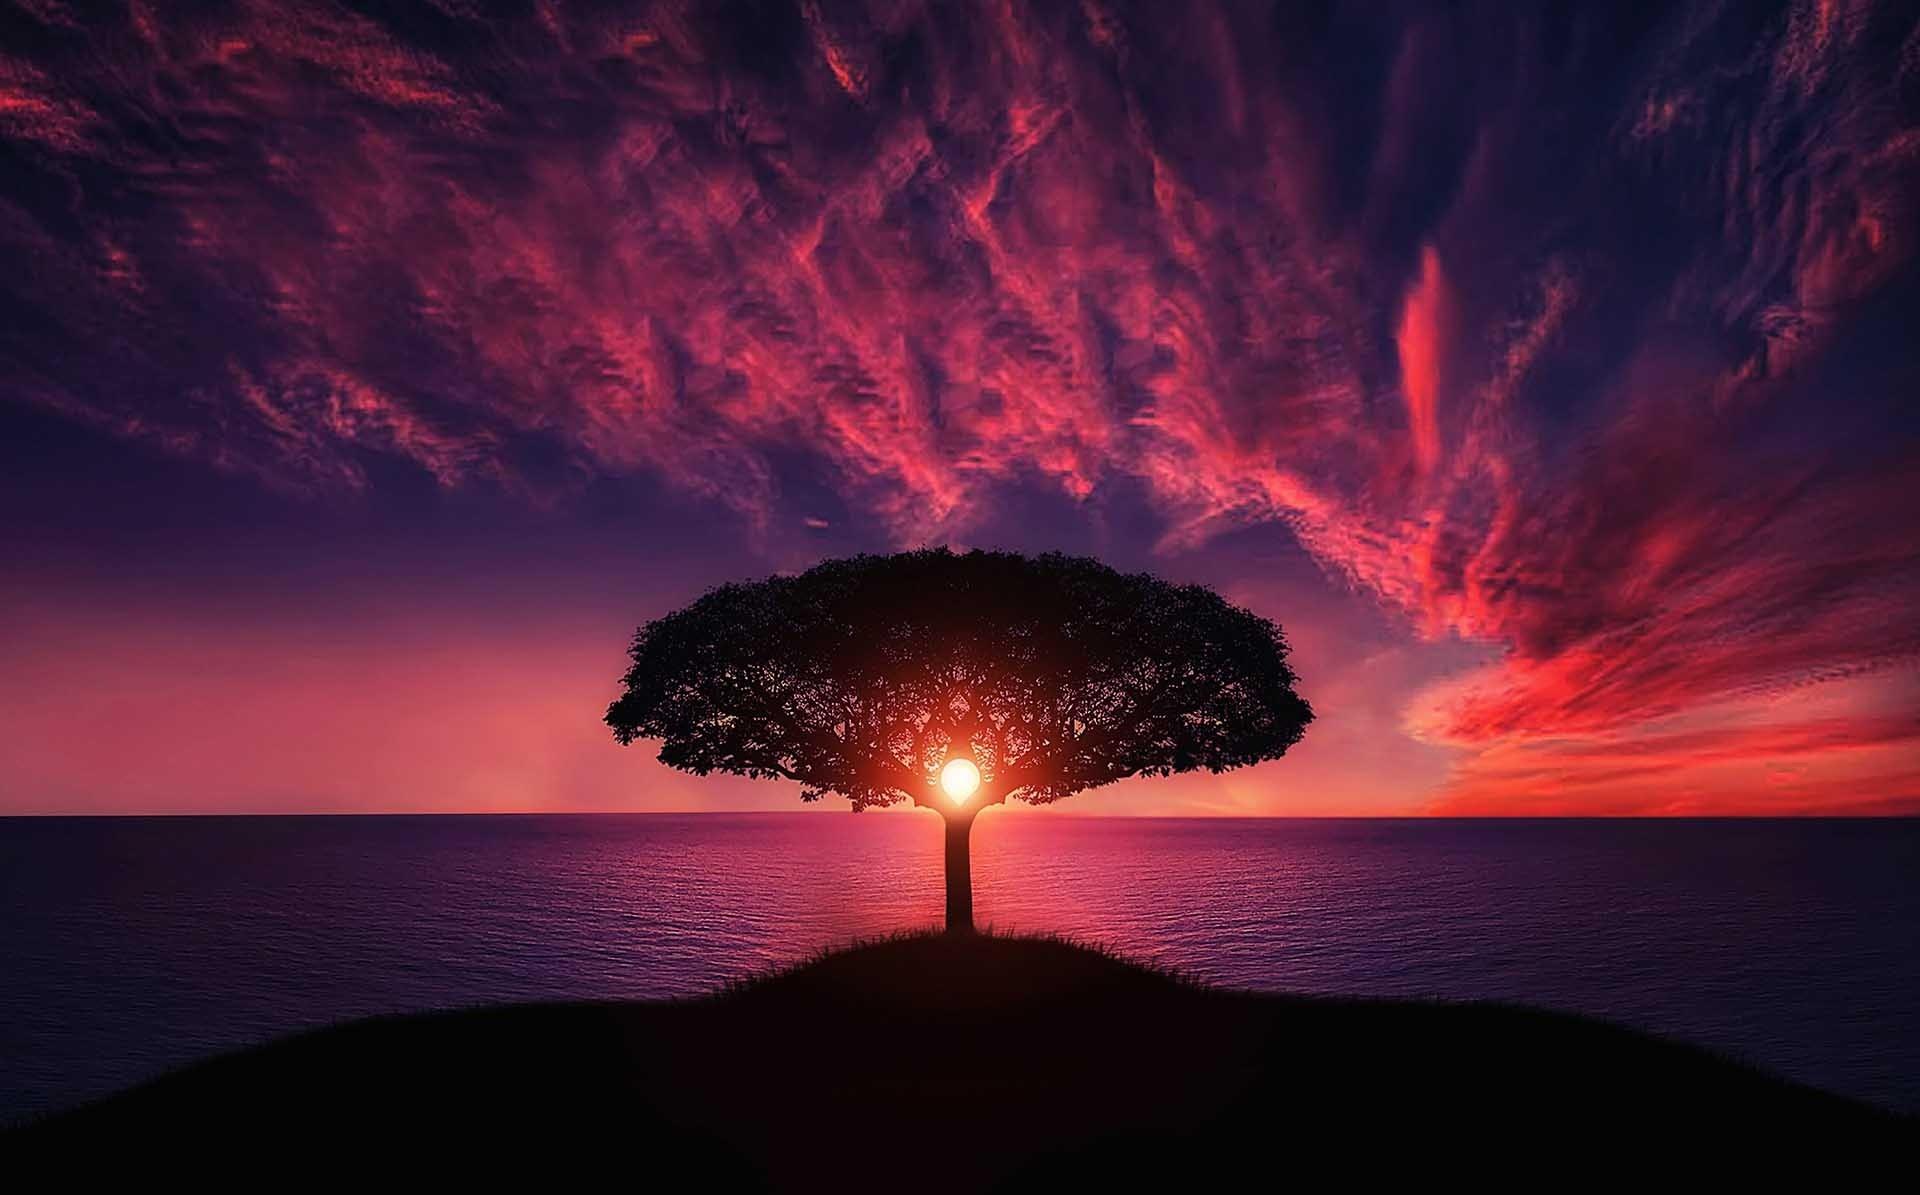 Nature wallpaper of landscape, nature, sky, sunset